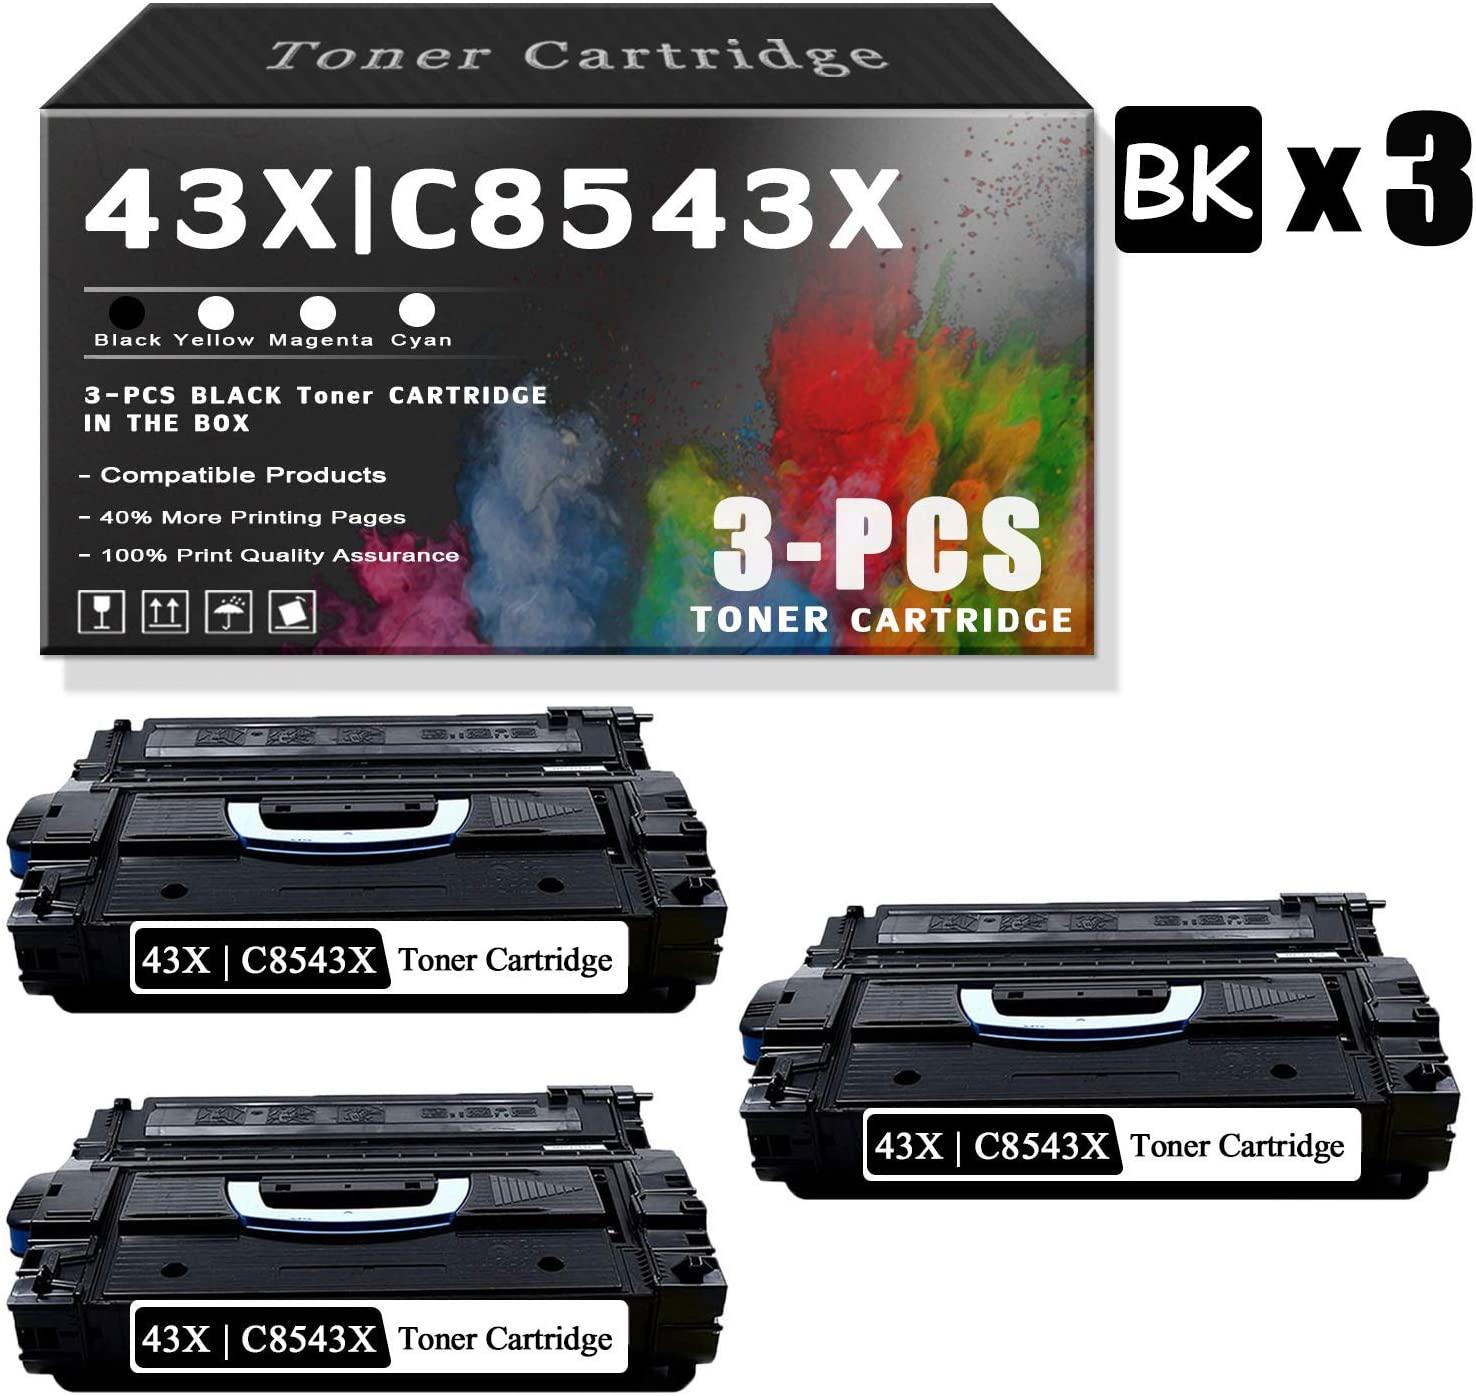 3-Pack 43X   C8543X Black TonerCartridgeCompatible for HP InkCartridgeReplacementforHP Laserjet 9040 9040dn 9050 9050n 9000N 9000dn; 9040 9000 9050 9040/9050 M9040/M9050 SeriesPrinters.